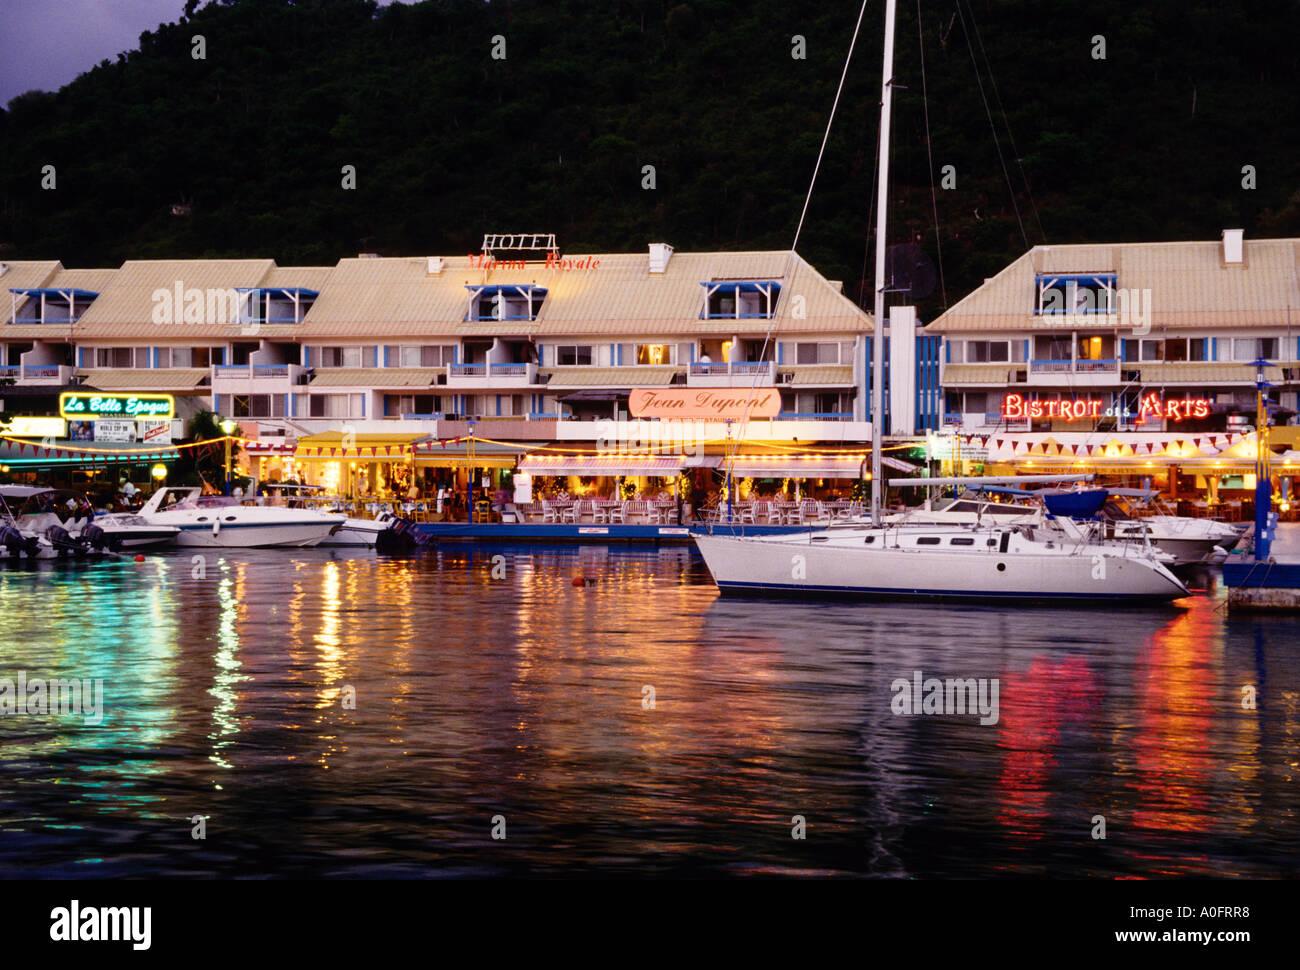 Marigot saint martin fwi port la royale marina with - Marina port la royale marigot st martin ...